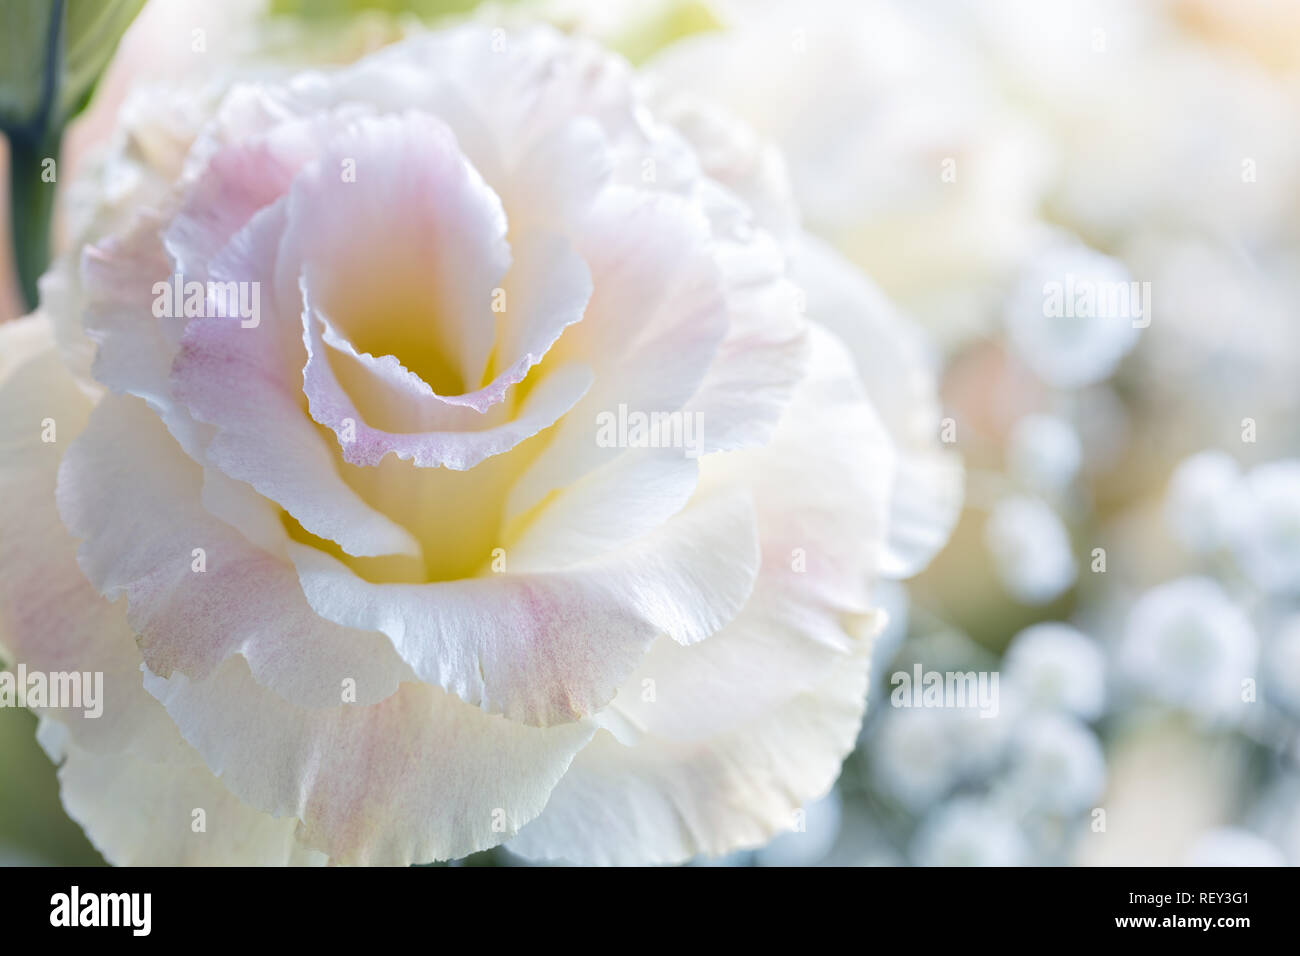 Beautiful and gentle pink Eustoma flowers, Lisianthus, tulip gentian, eustomas. Close up. - Stock Image